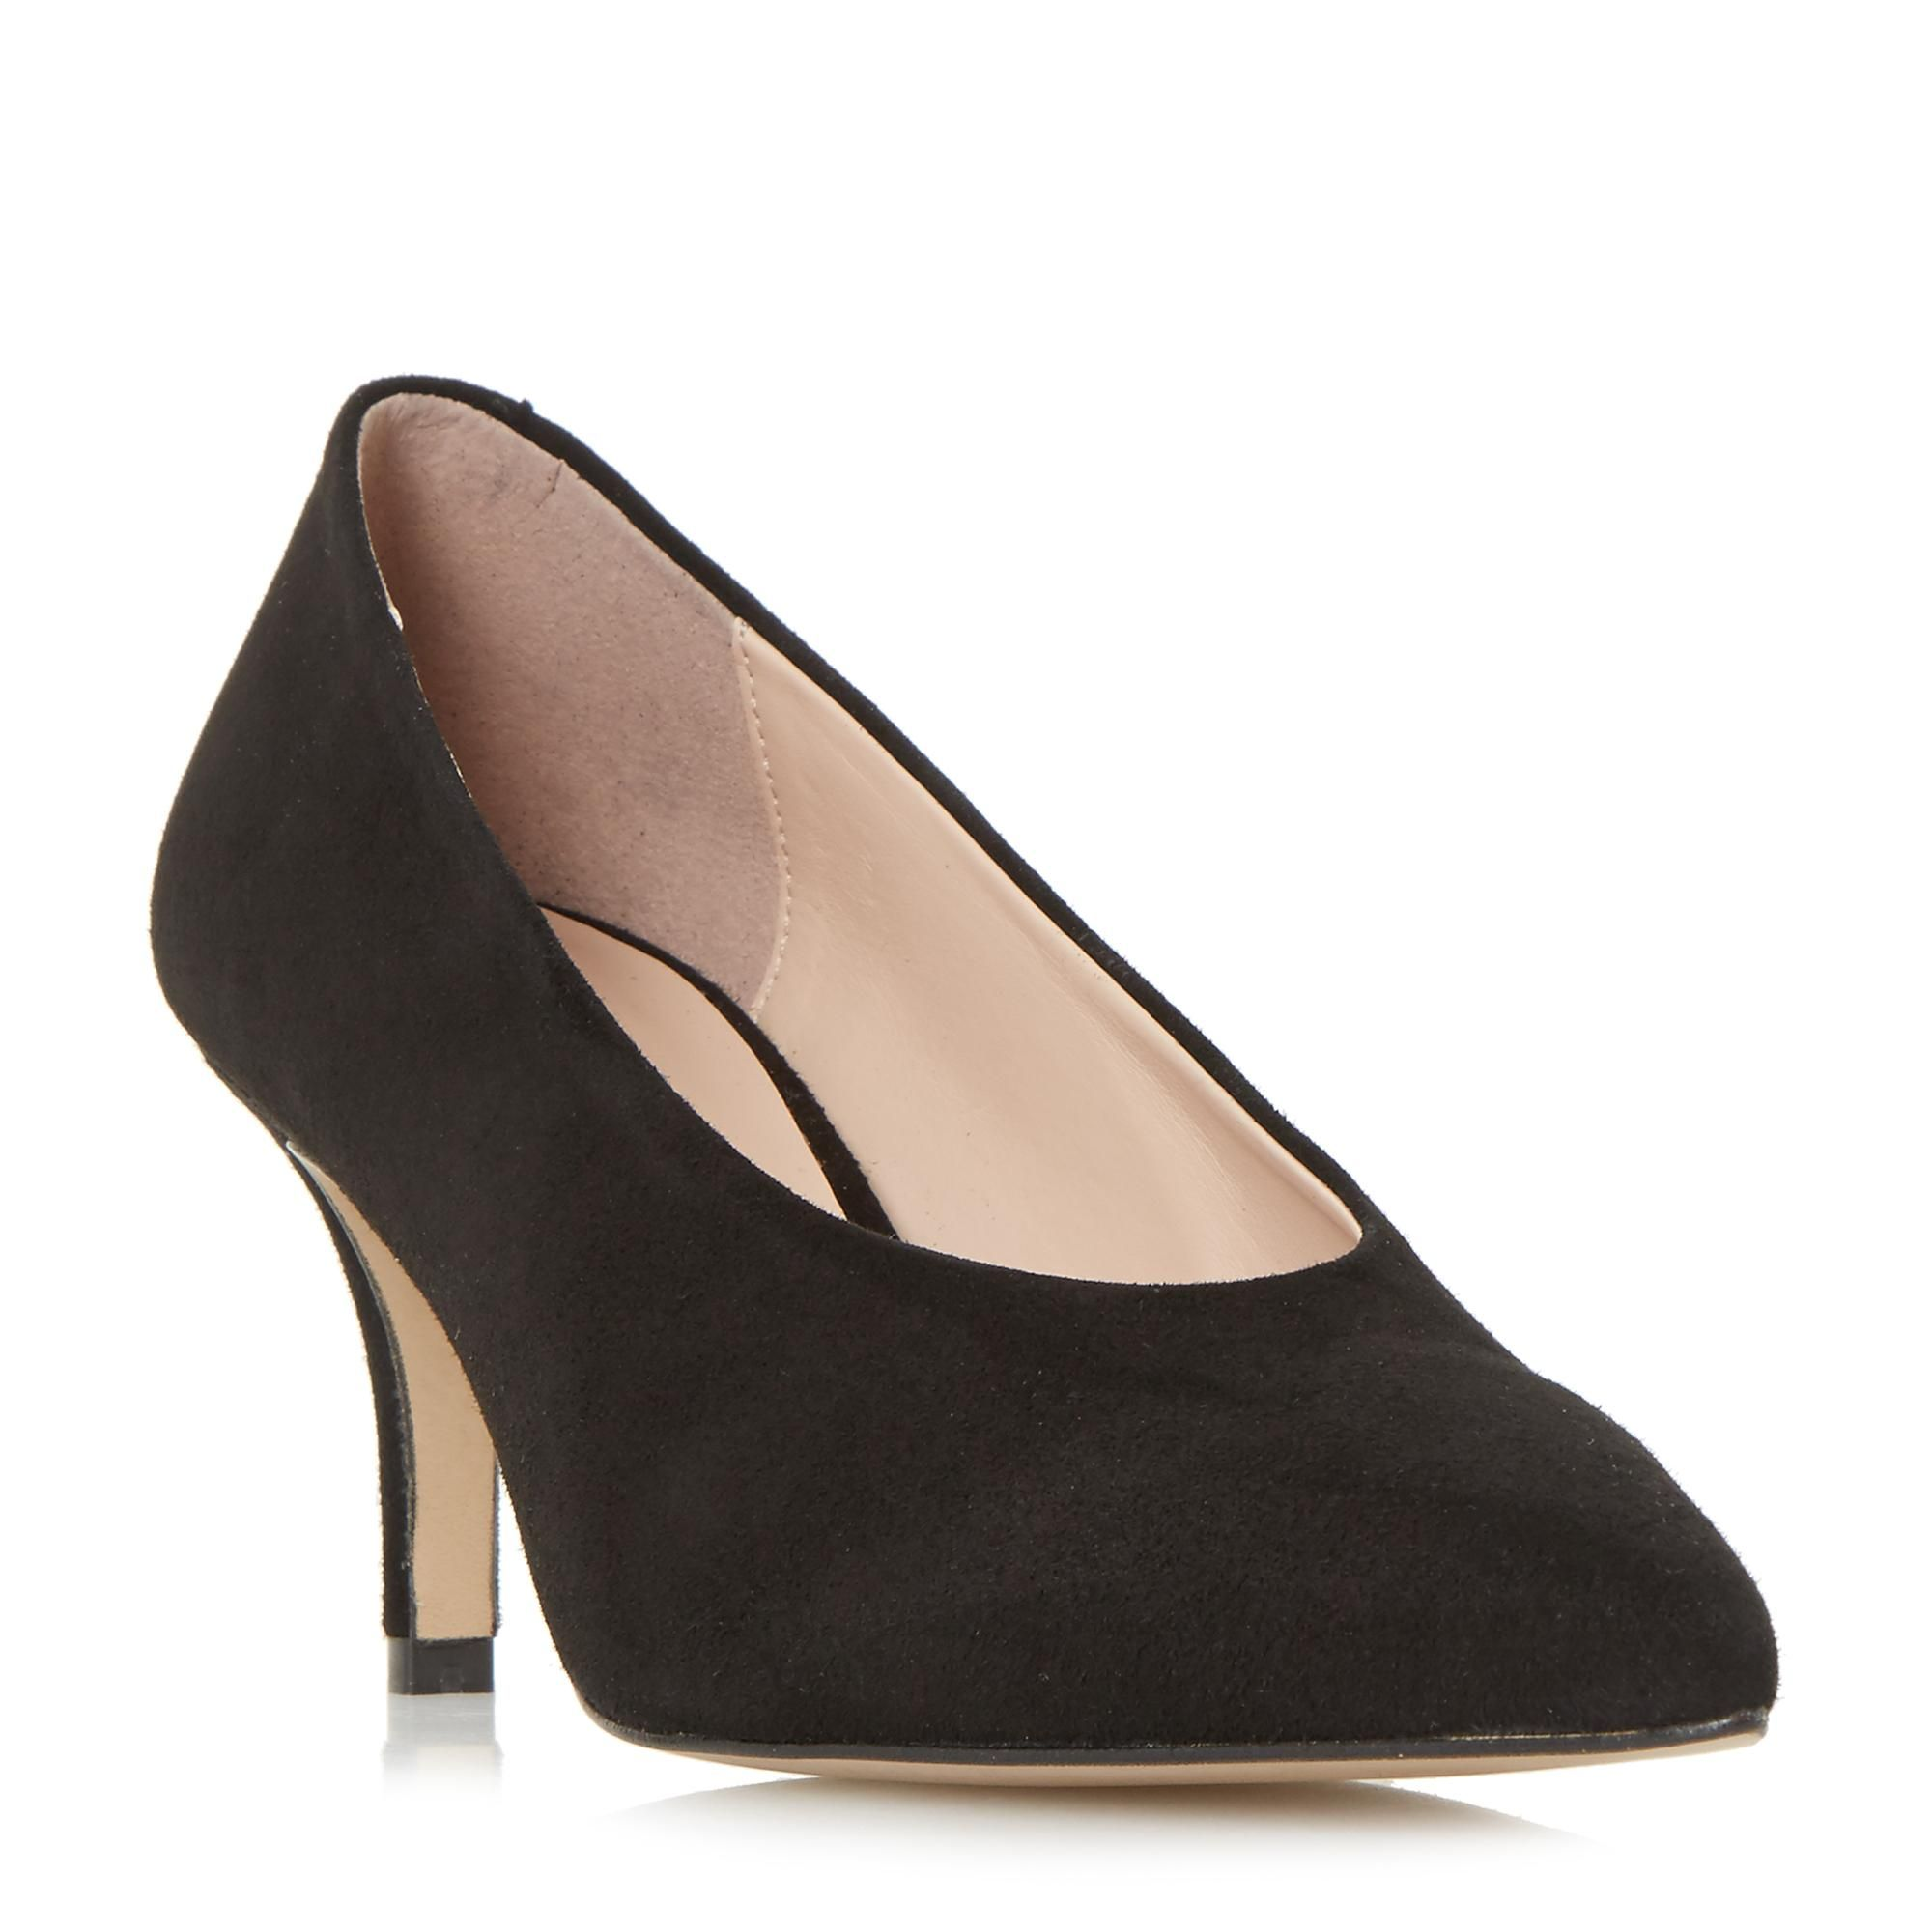 4b117623b51a DUNE LADIES AMORRELL - V Cut High Vamp Point Toe Court Shoe - black